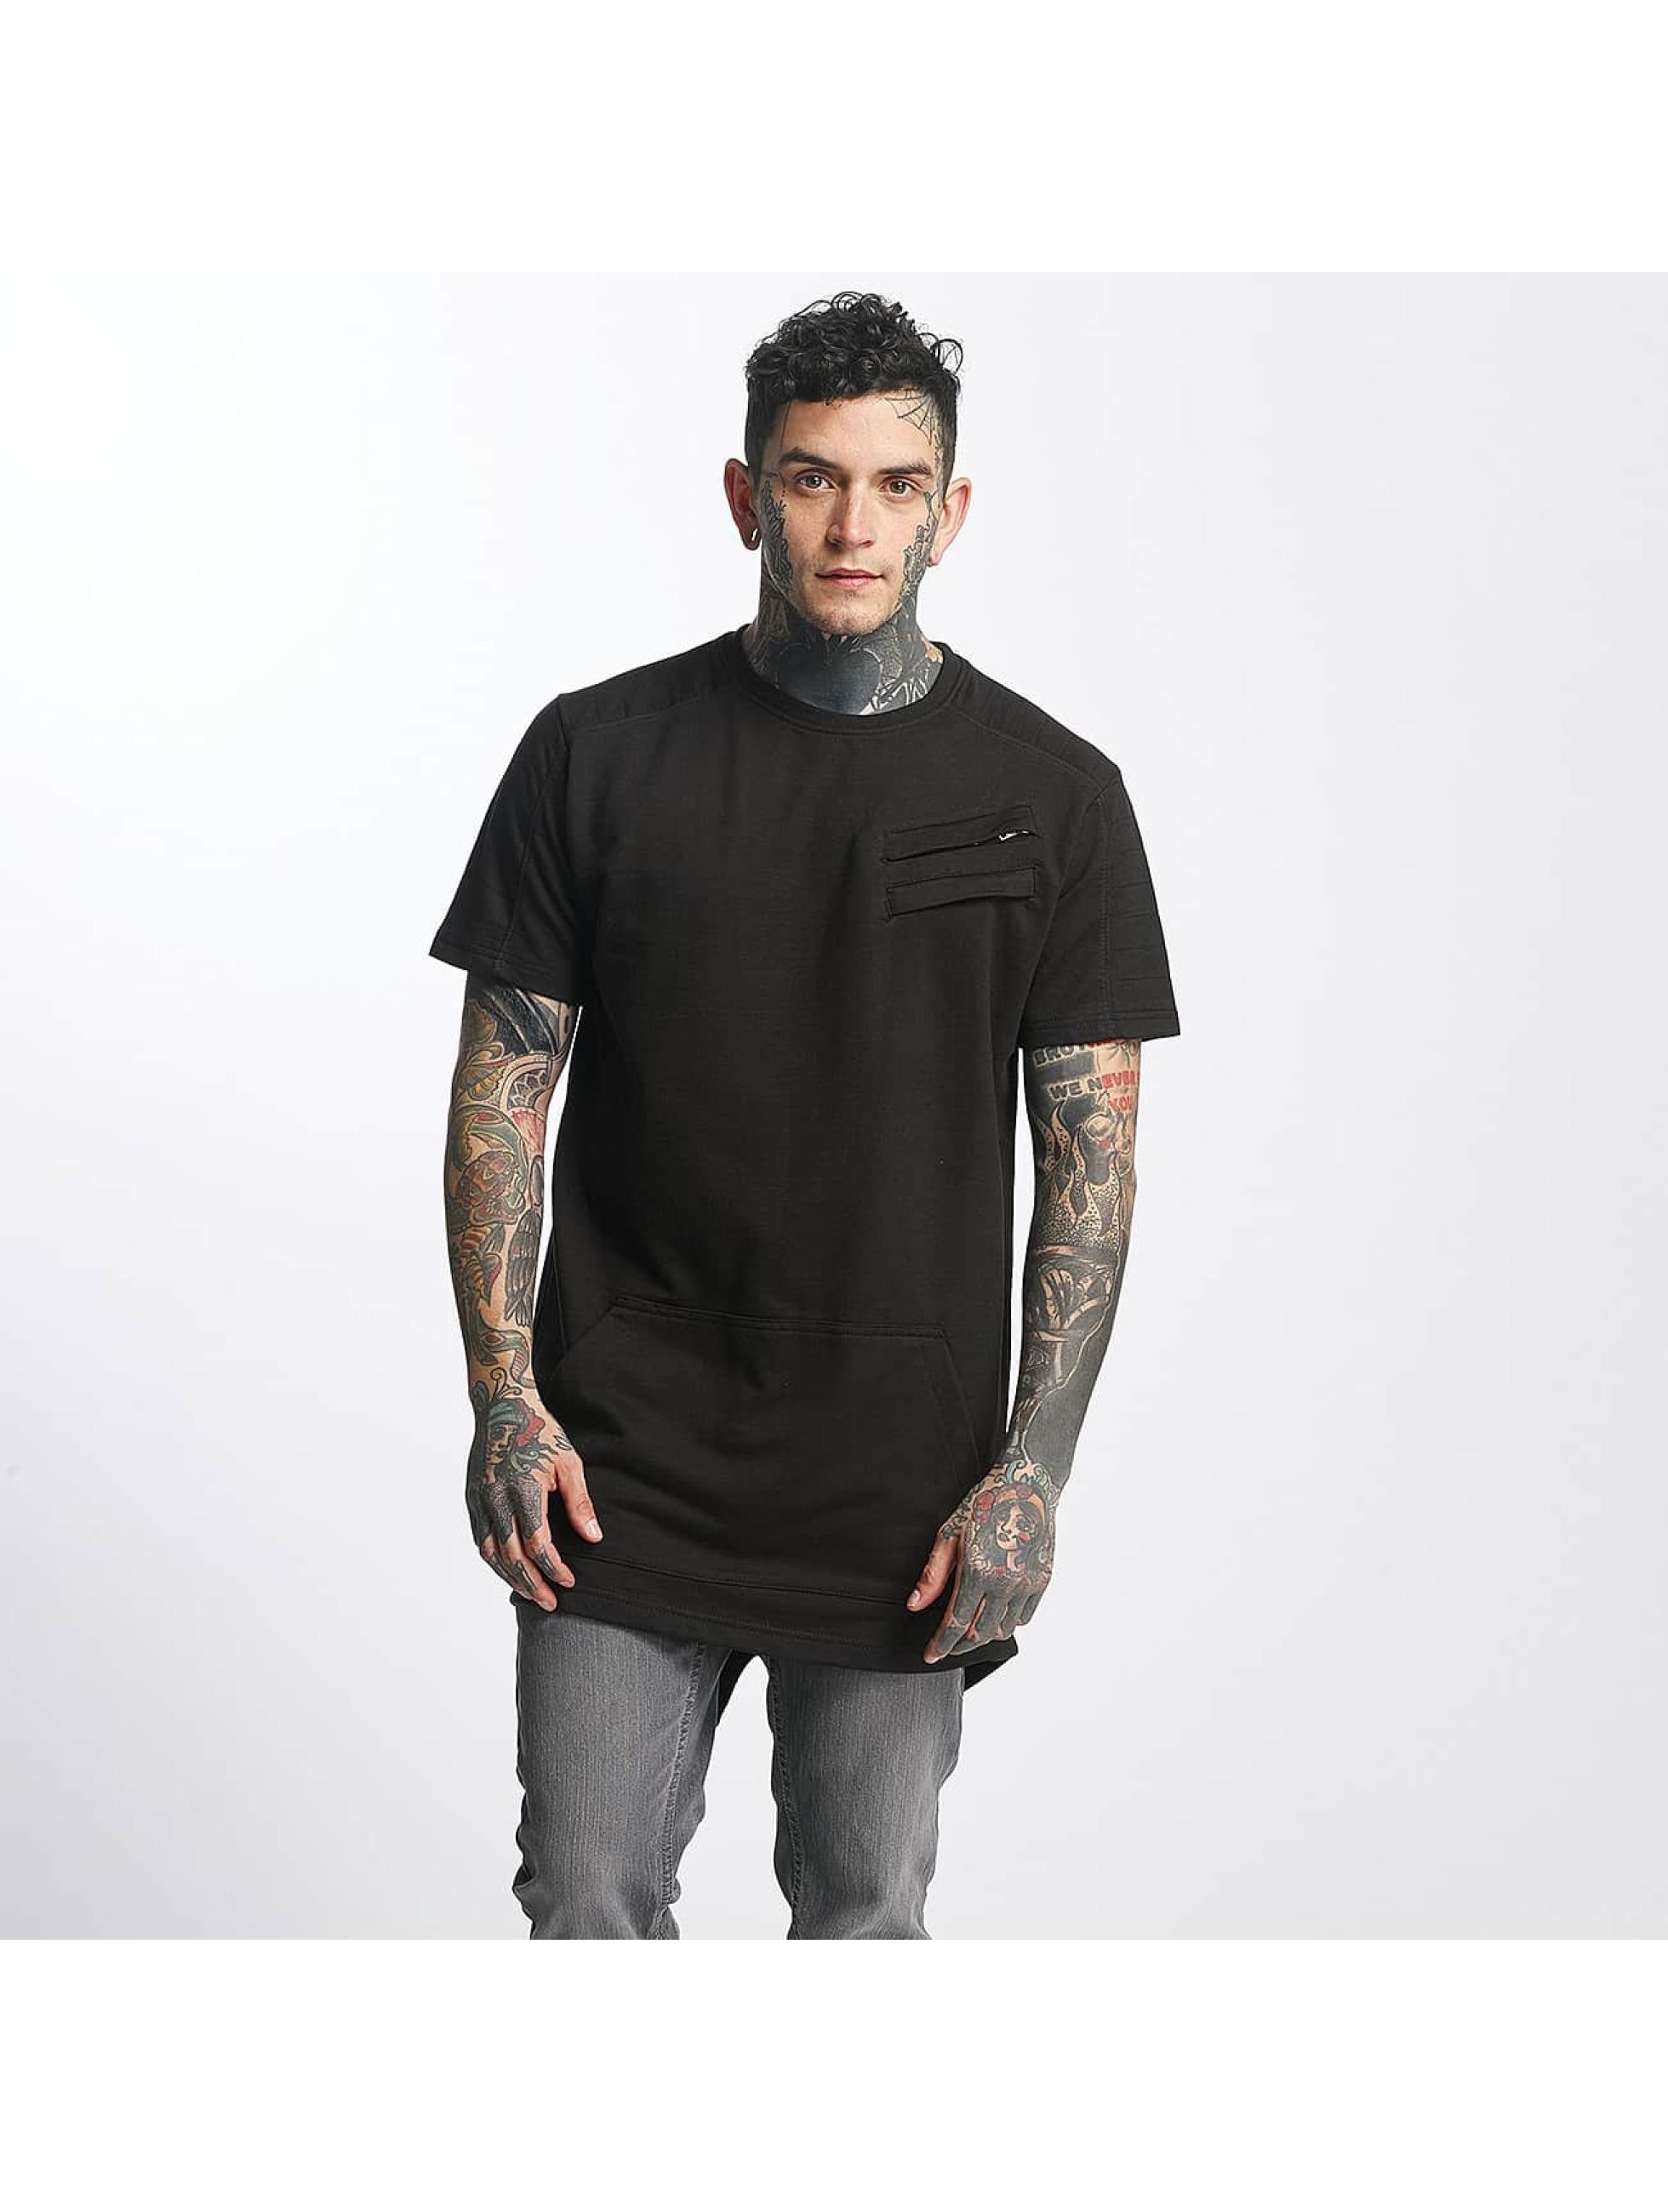 Tuffskull Männer T-Shirt heavy in schwarz